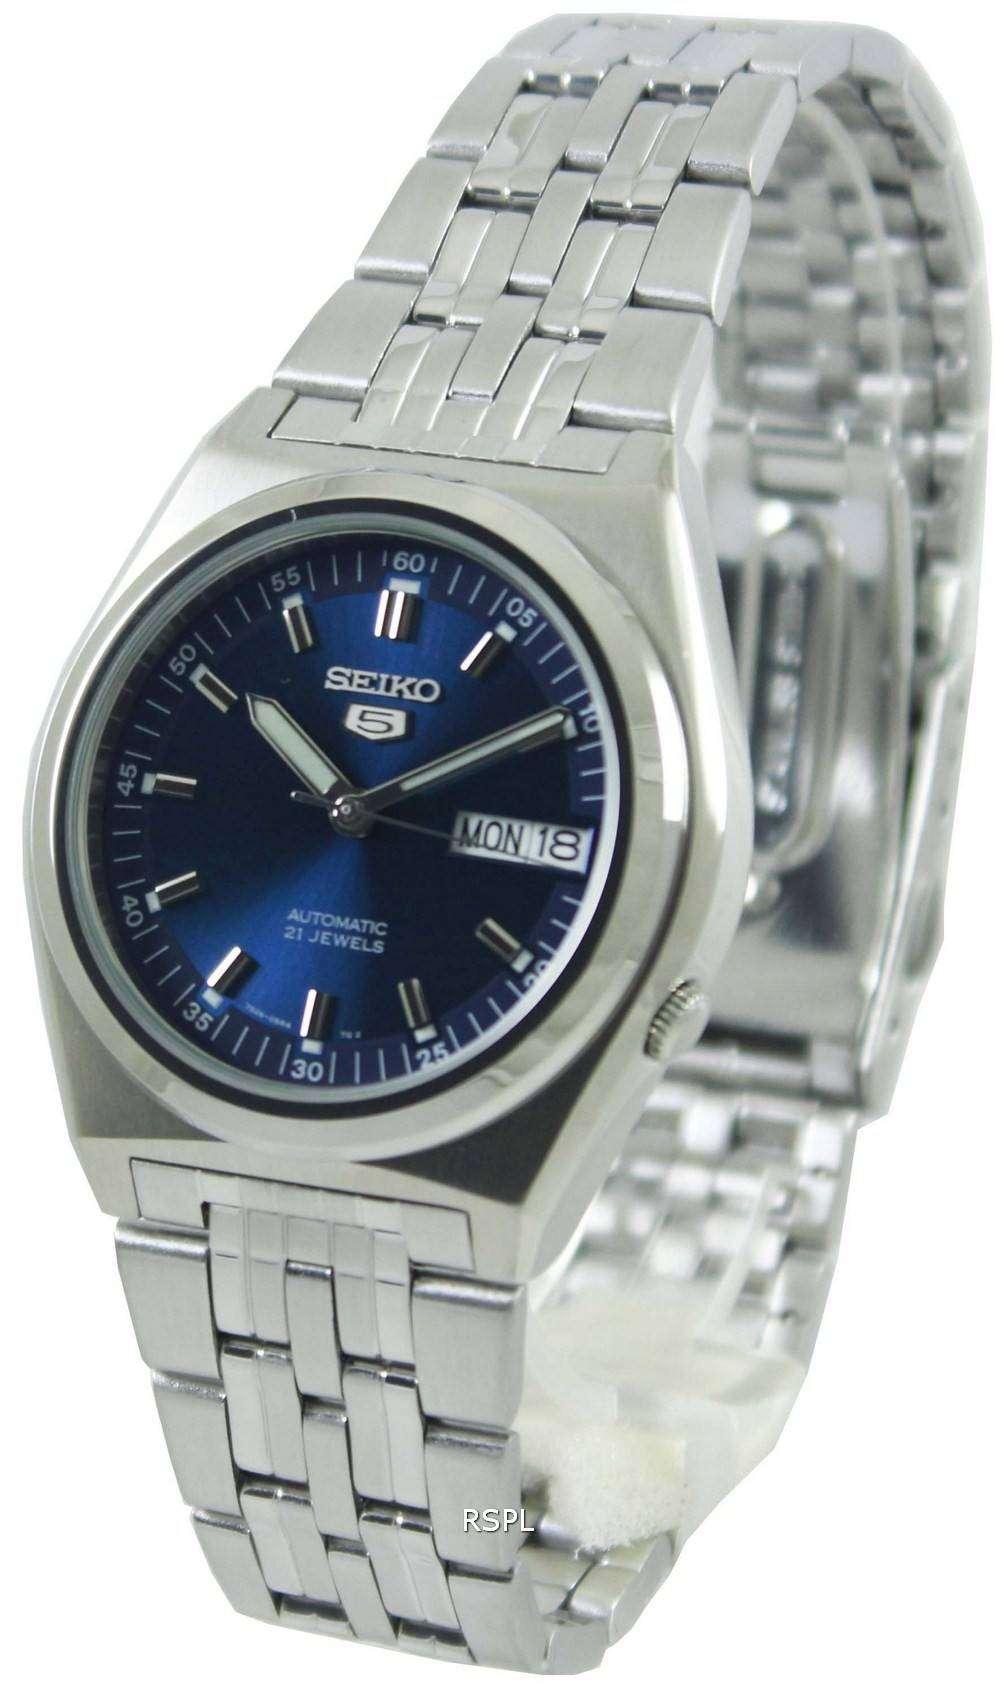 Seiko 5 Automatic 21 Jewels SNK647K1 SNK647K Mens Watch ...